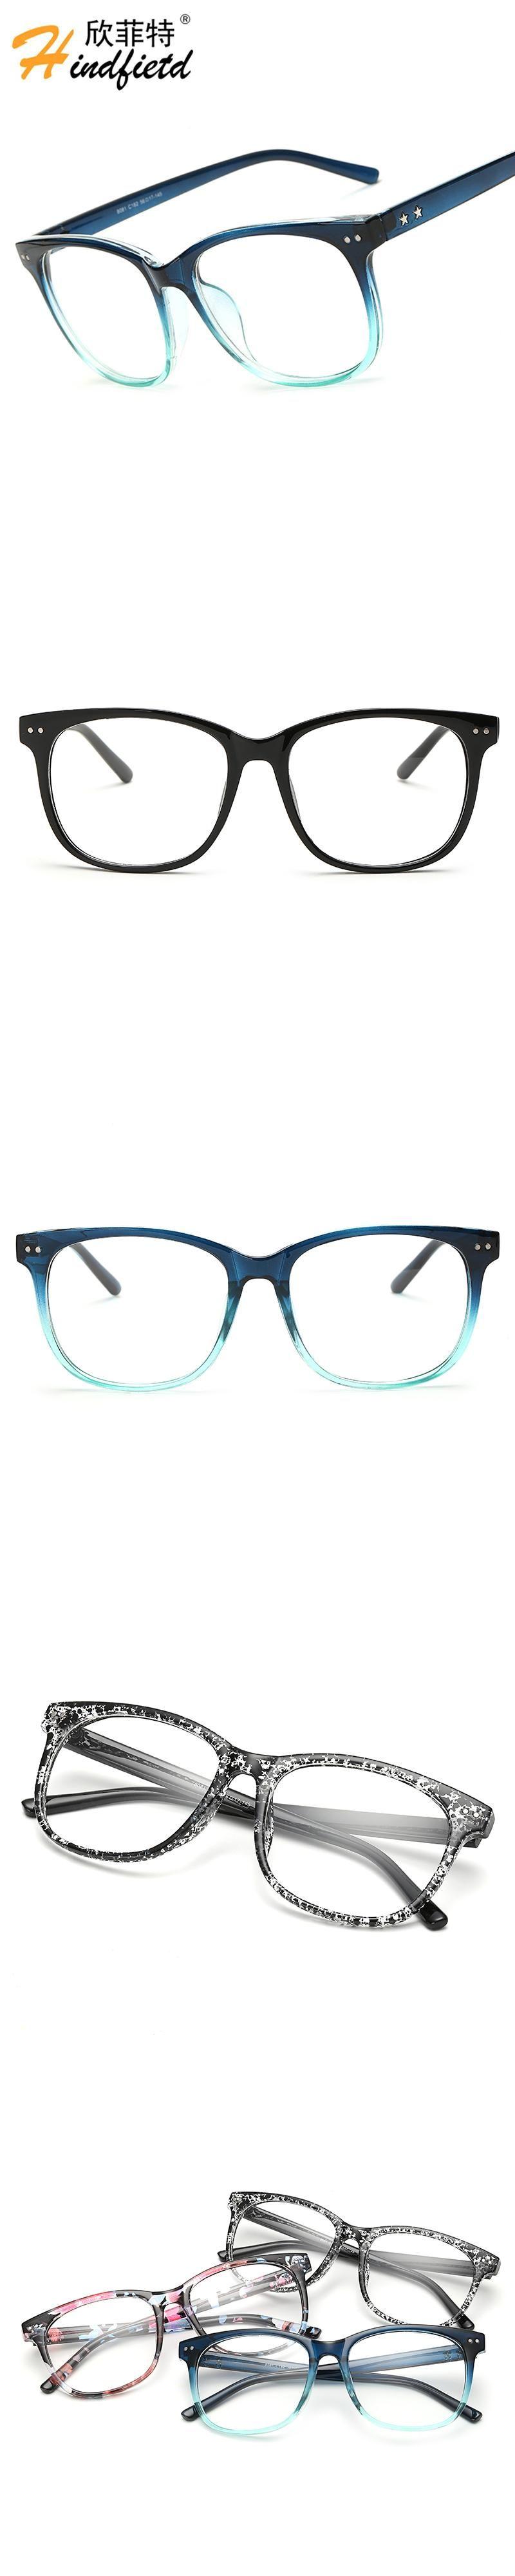 Hindfield Plain Glass Spectacles Vintage Eyeglasses Women Men Sports ...